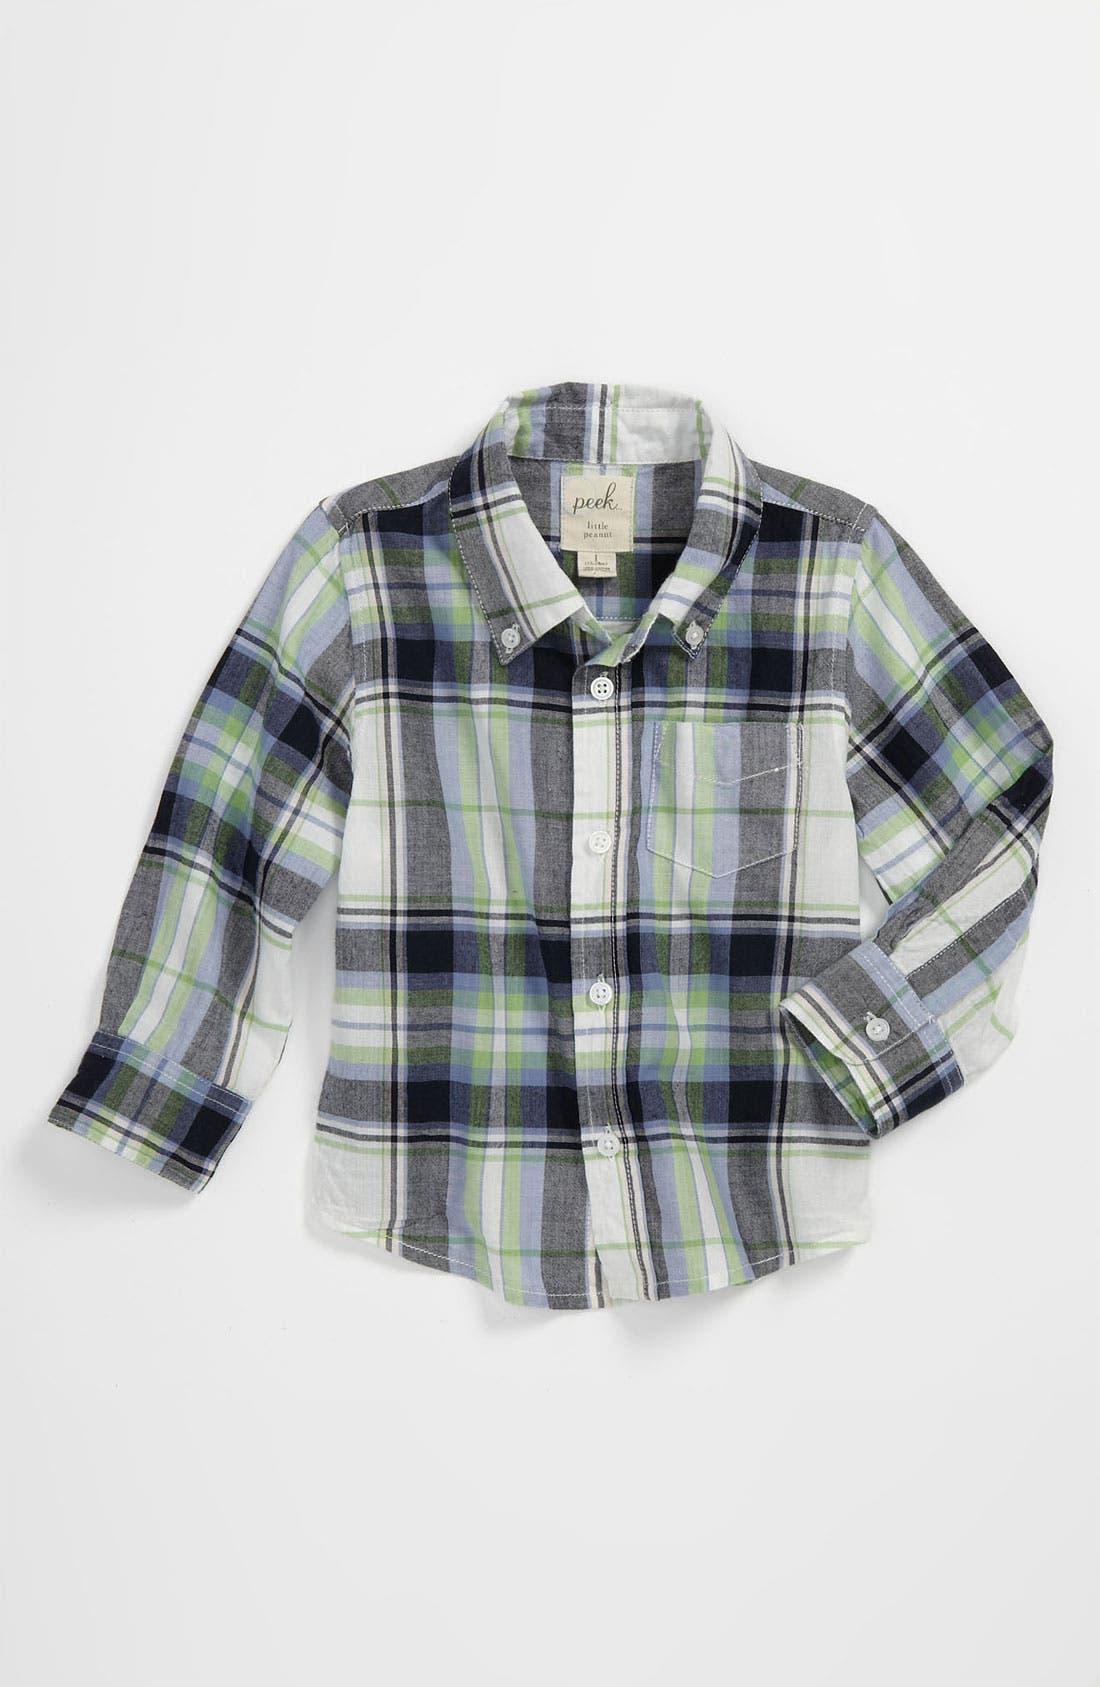 Alternate Image 1 Selected - Peek 'Easter Plaid' Shirt (Baby)